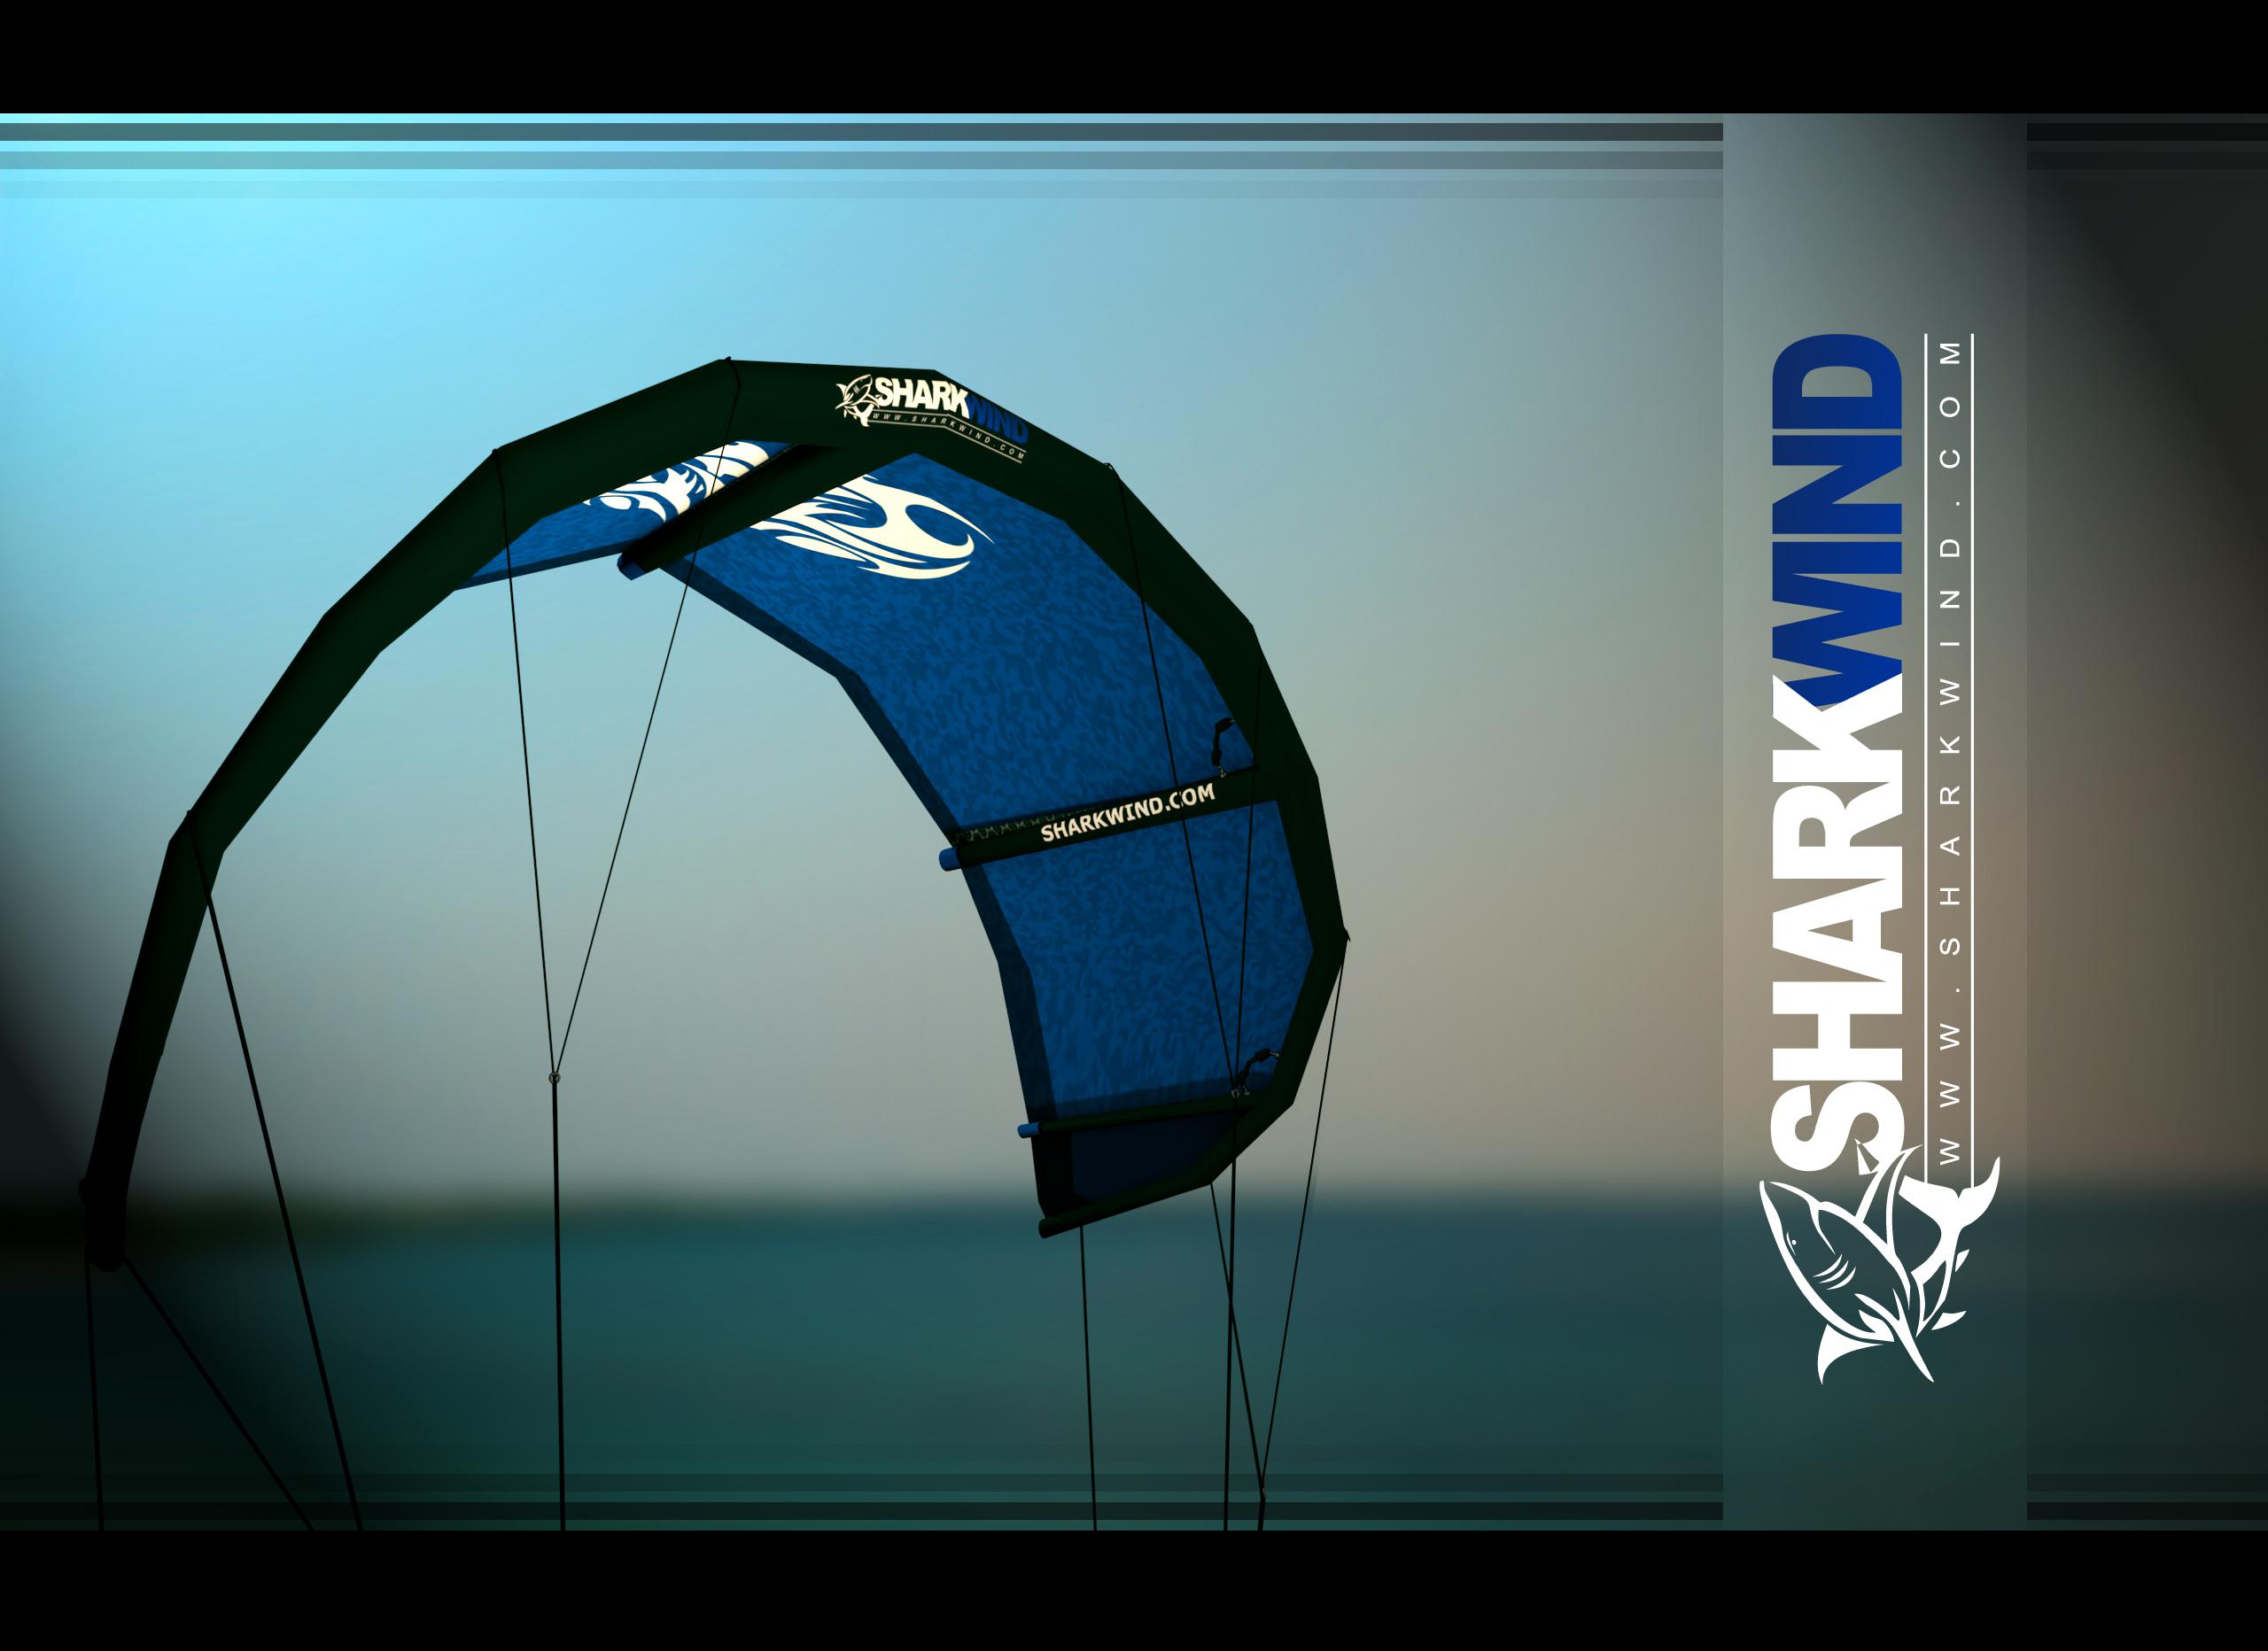 File Name : sharkwind_kiteboard_and_kitesurf_wallpaper_03498.jpg